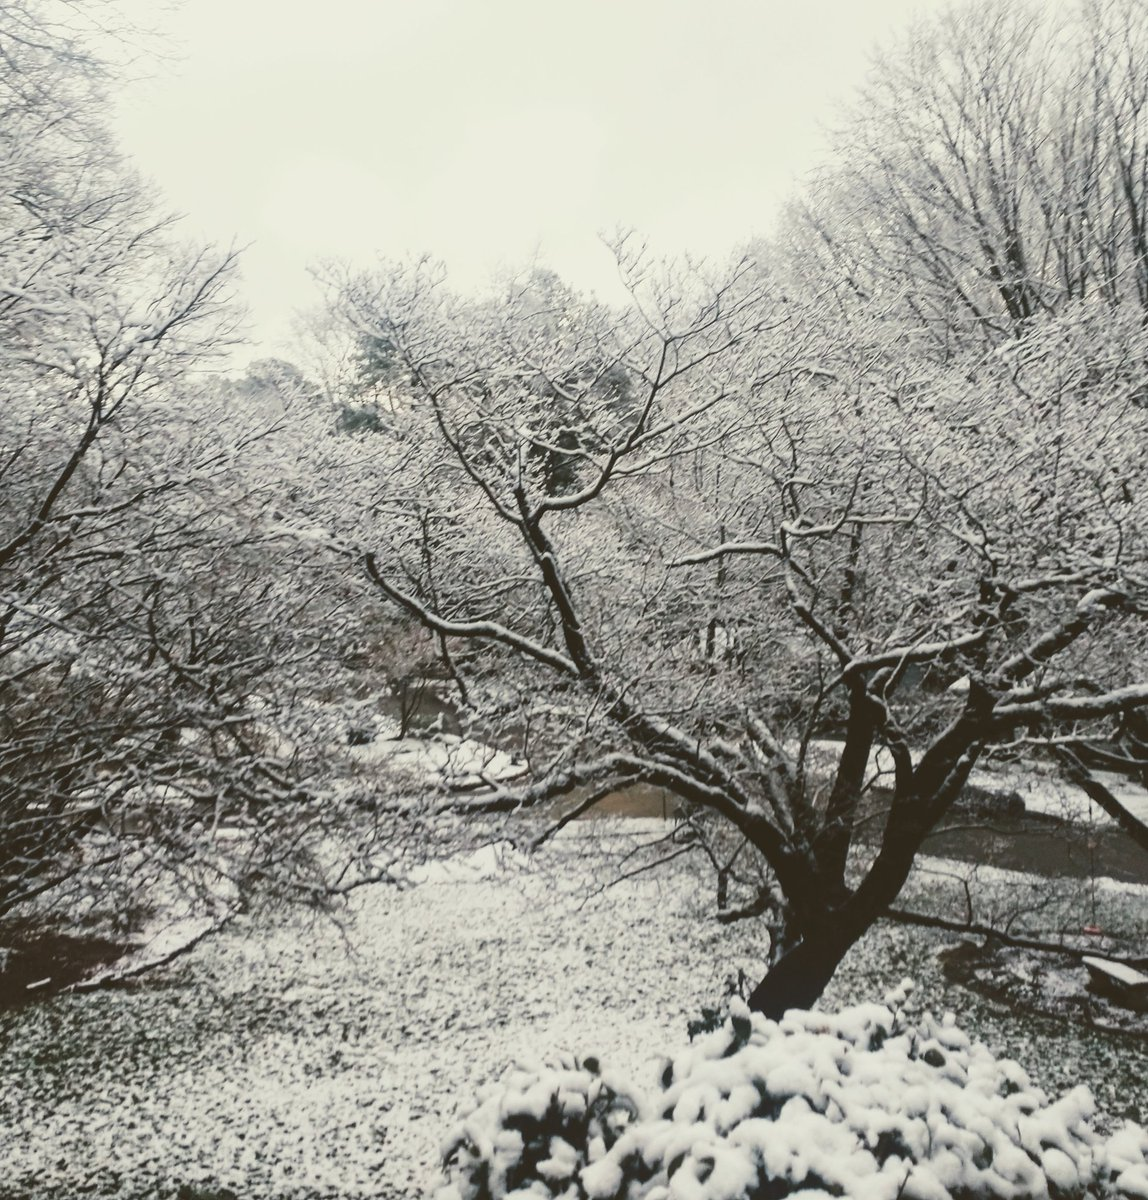 A beautiful dusting of snow. #snowfall #thursdaymorning #writerslife